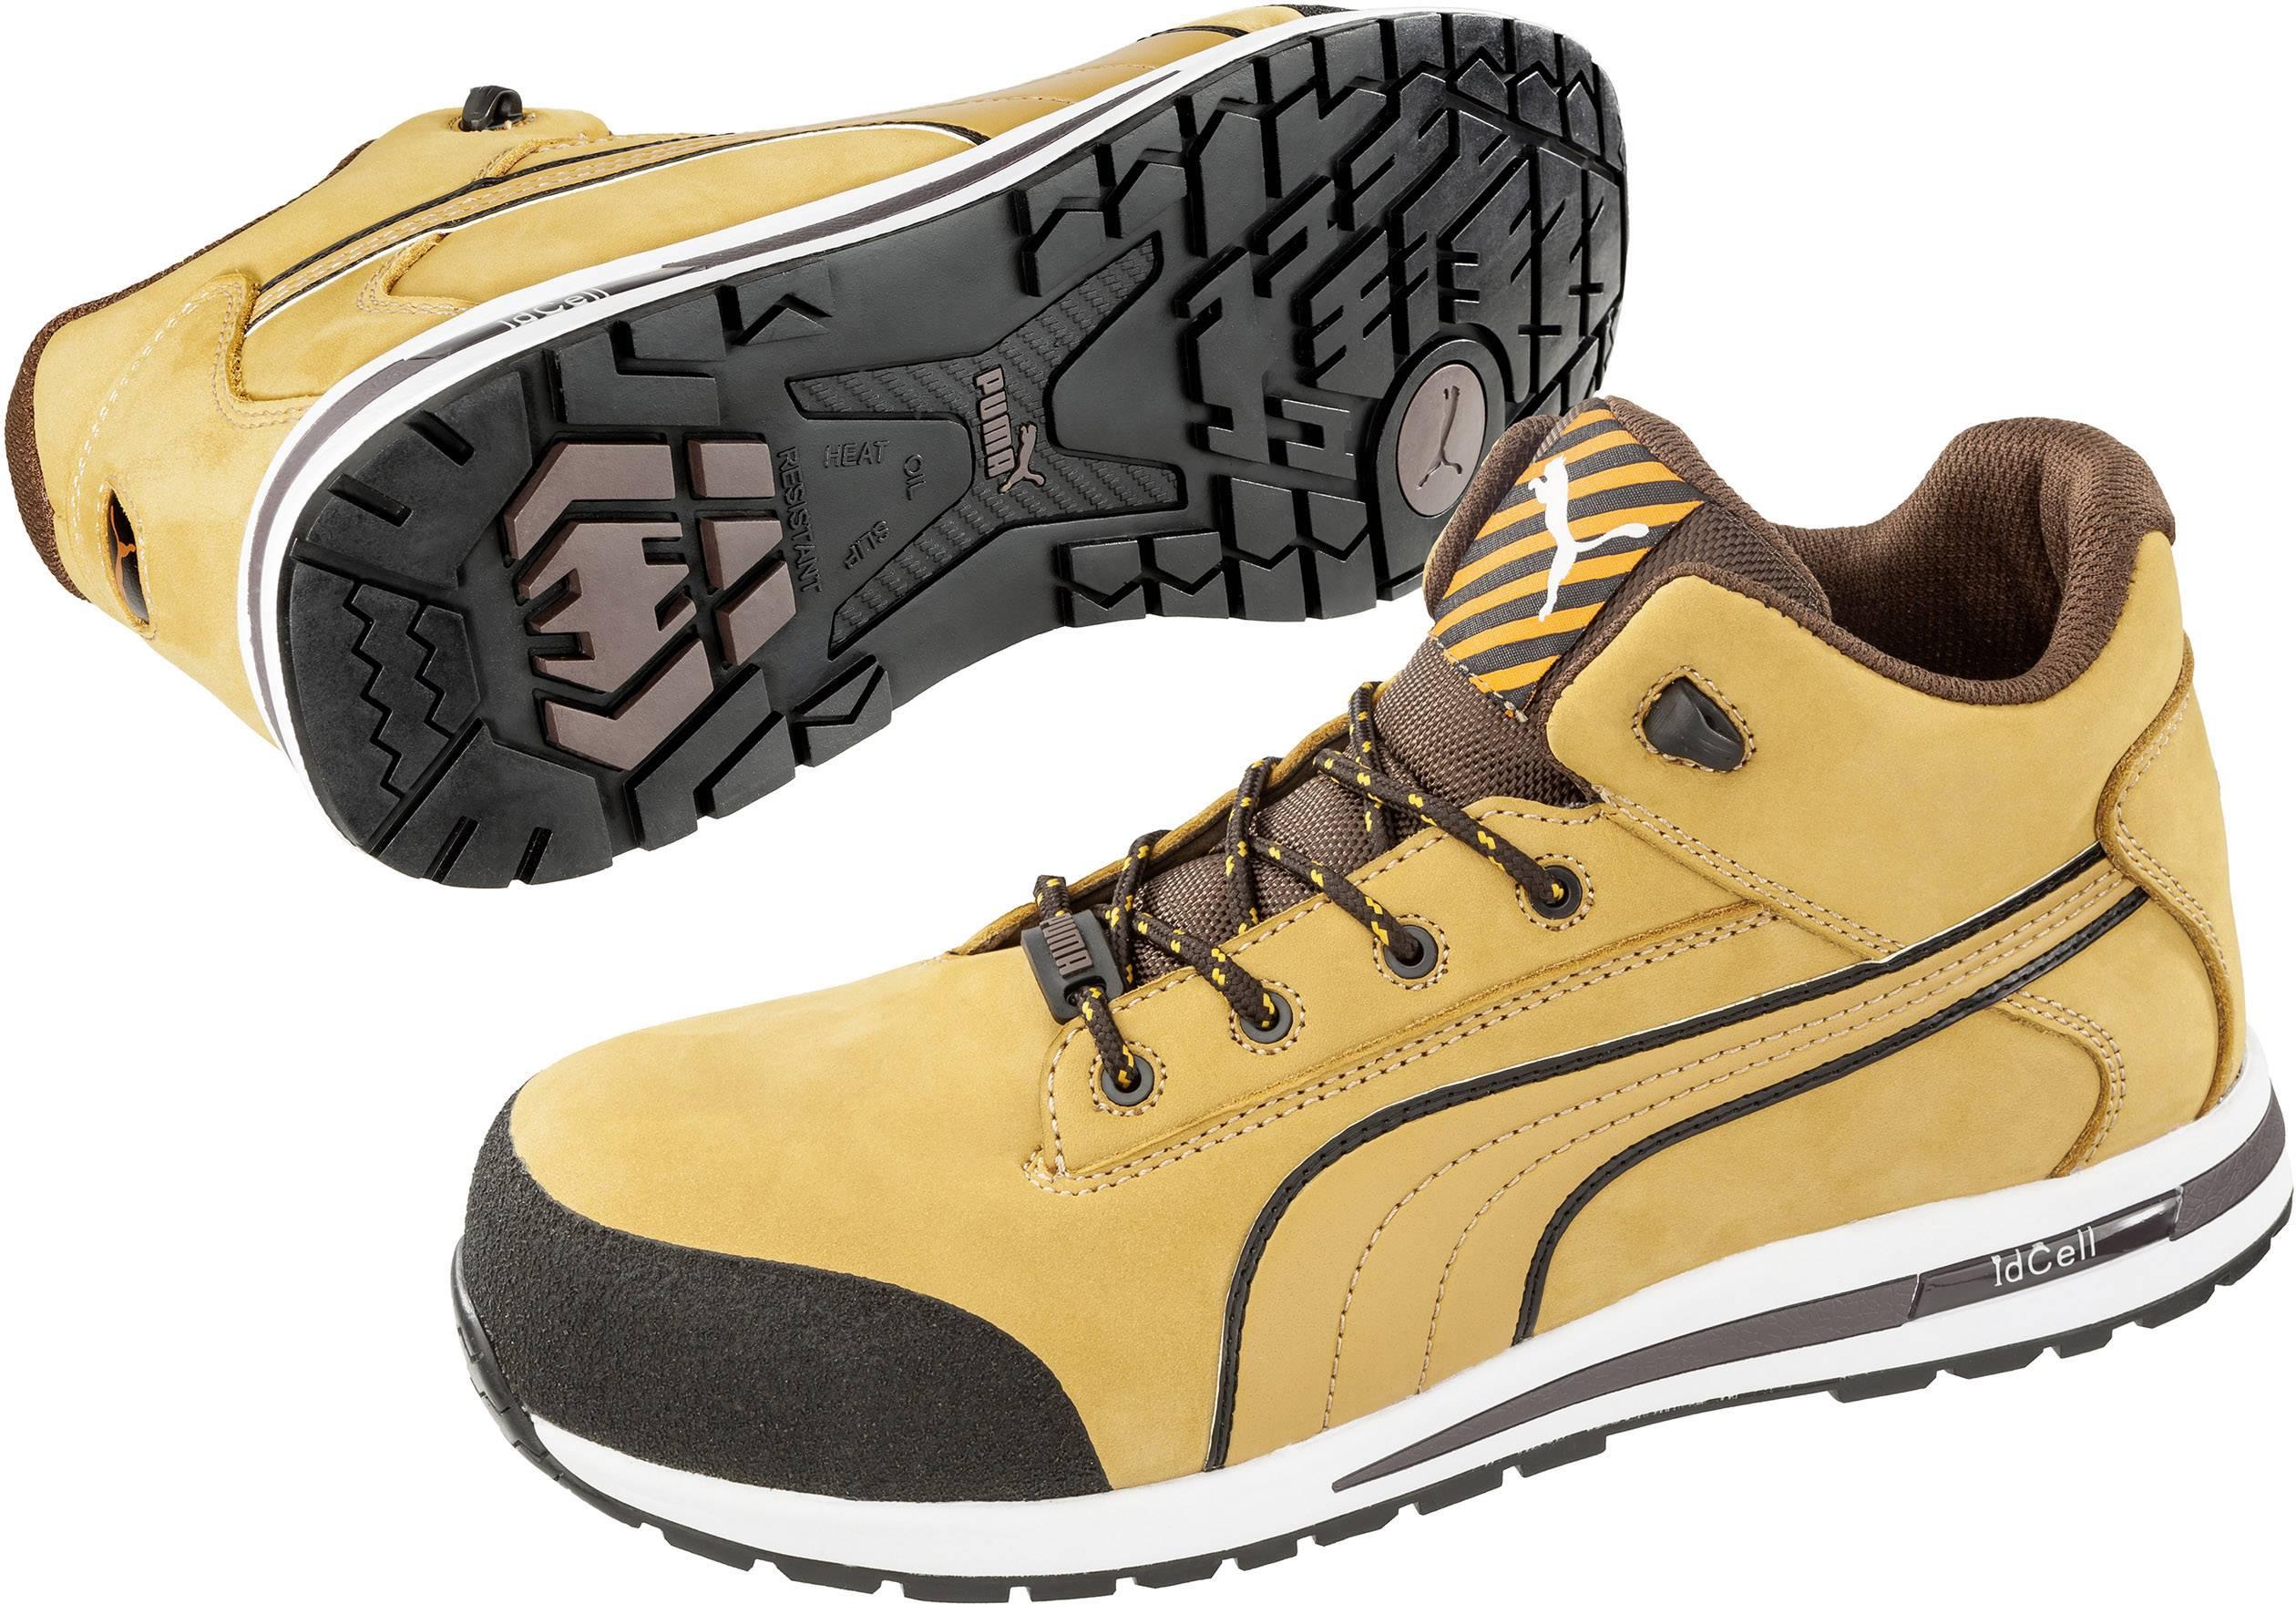 meilleure sélection c64c8 c3f64 Safety work boots S3 Size: 42 Beige, Brown PUMA Safety Dash ...